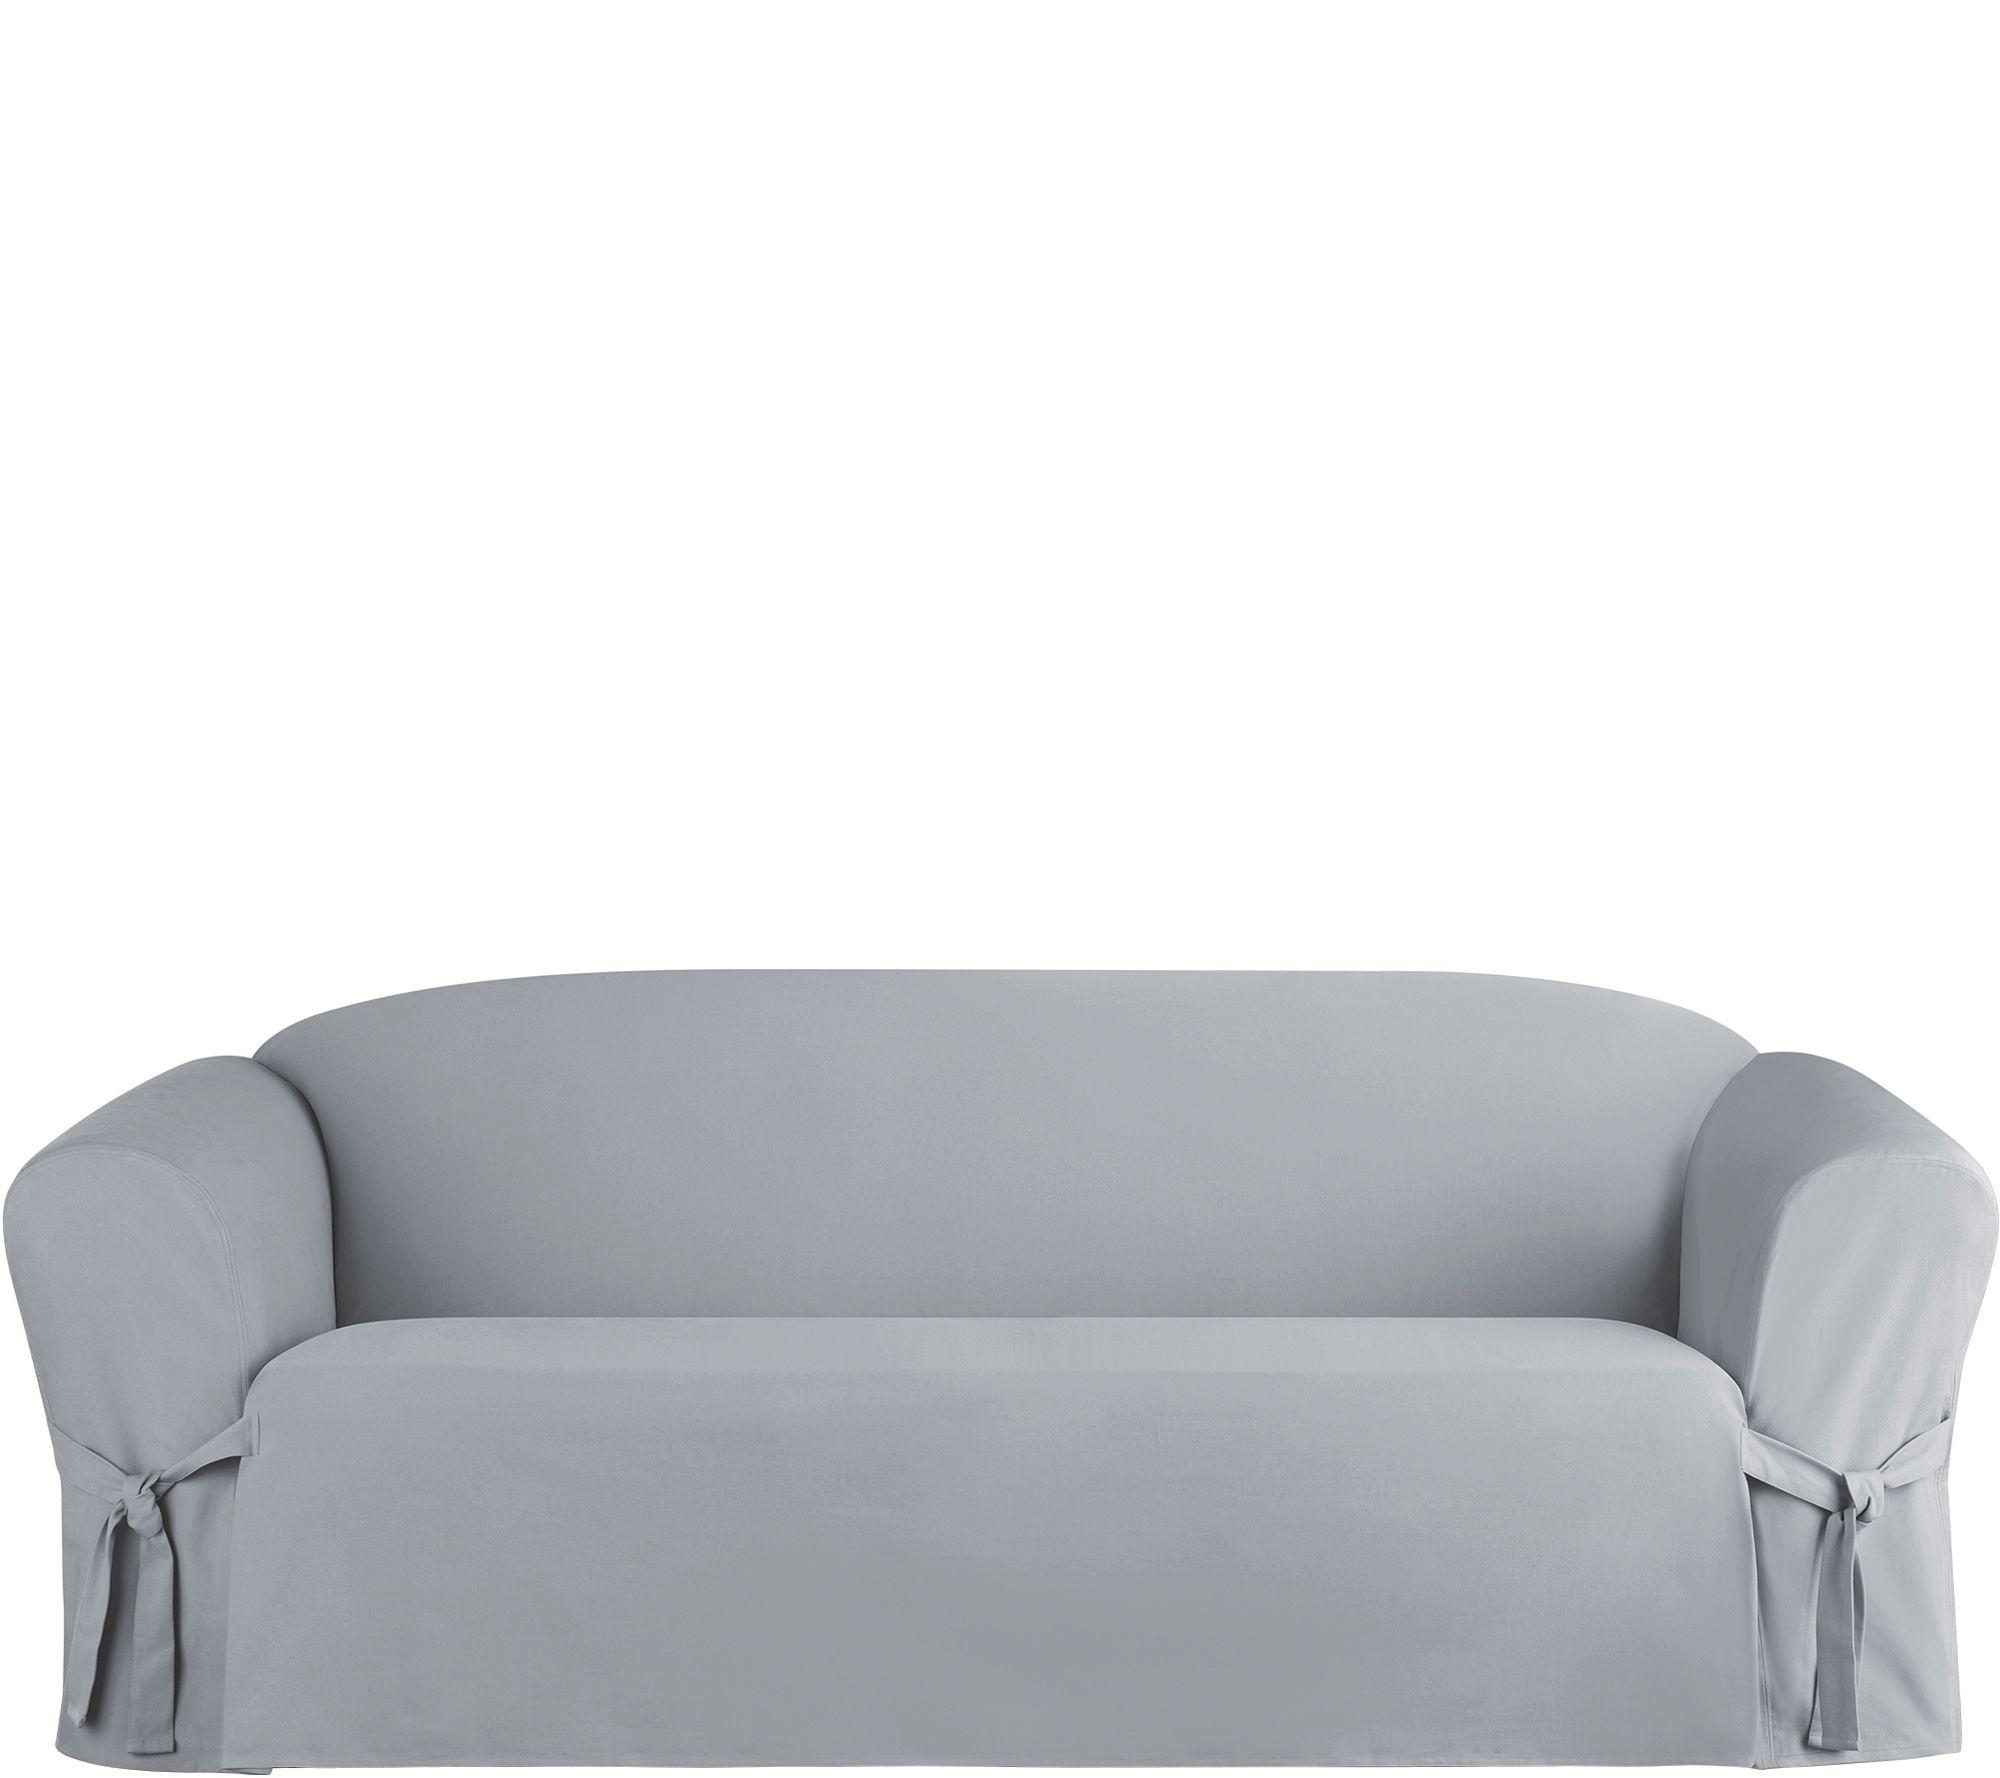 Heavyweight Cotton Duck Sofa Slip Cover